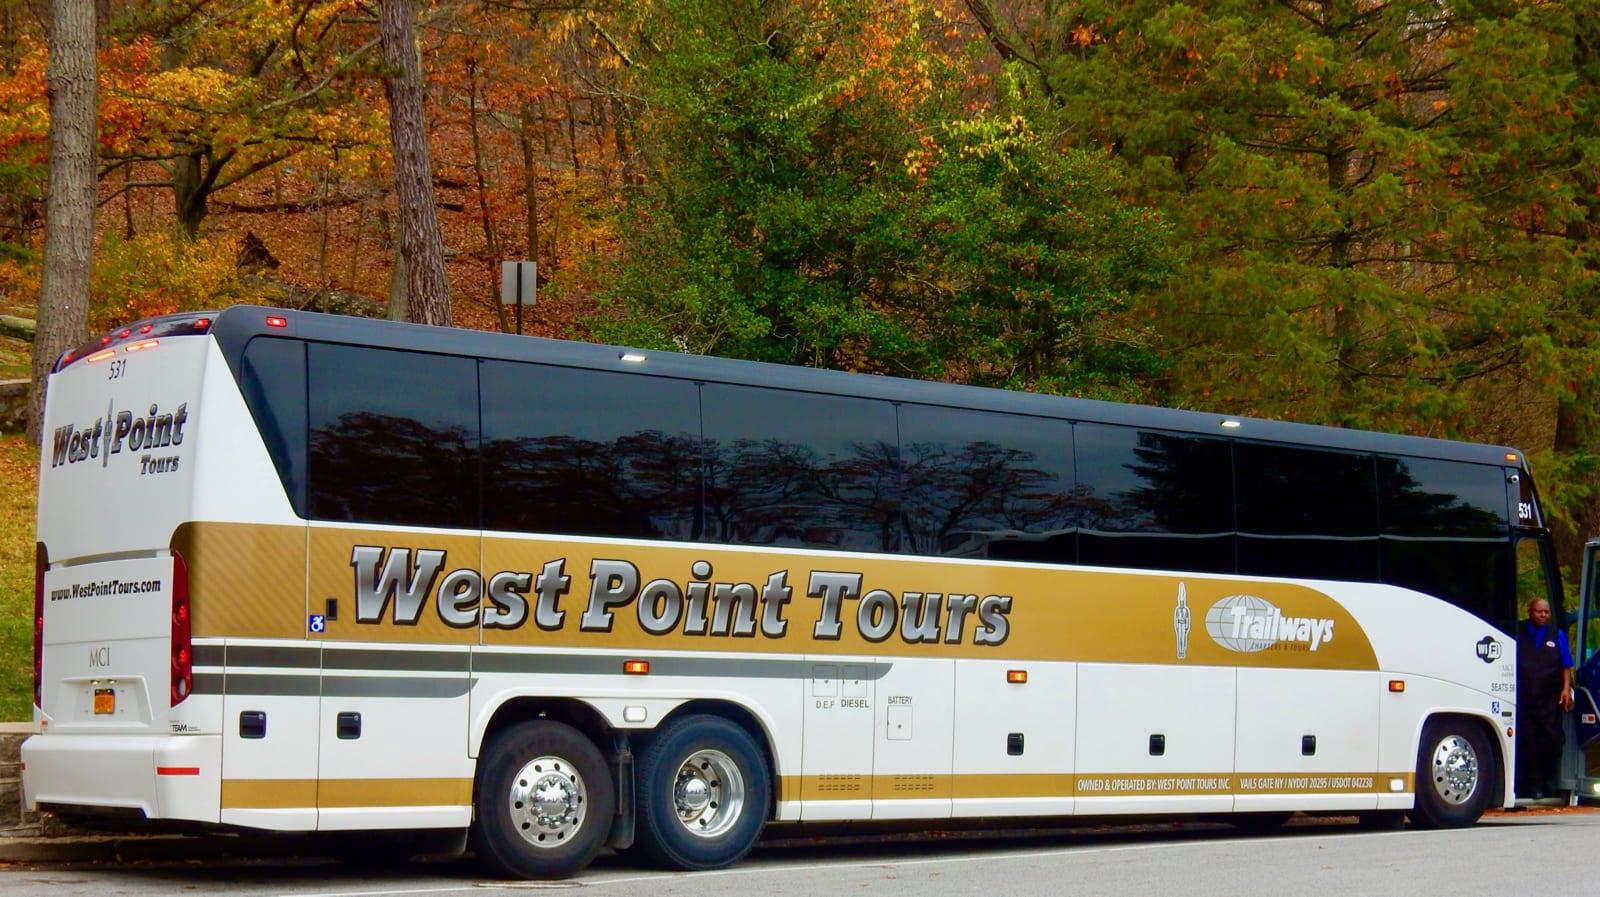 West Point Ny A Patriotic Getaway In